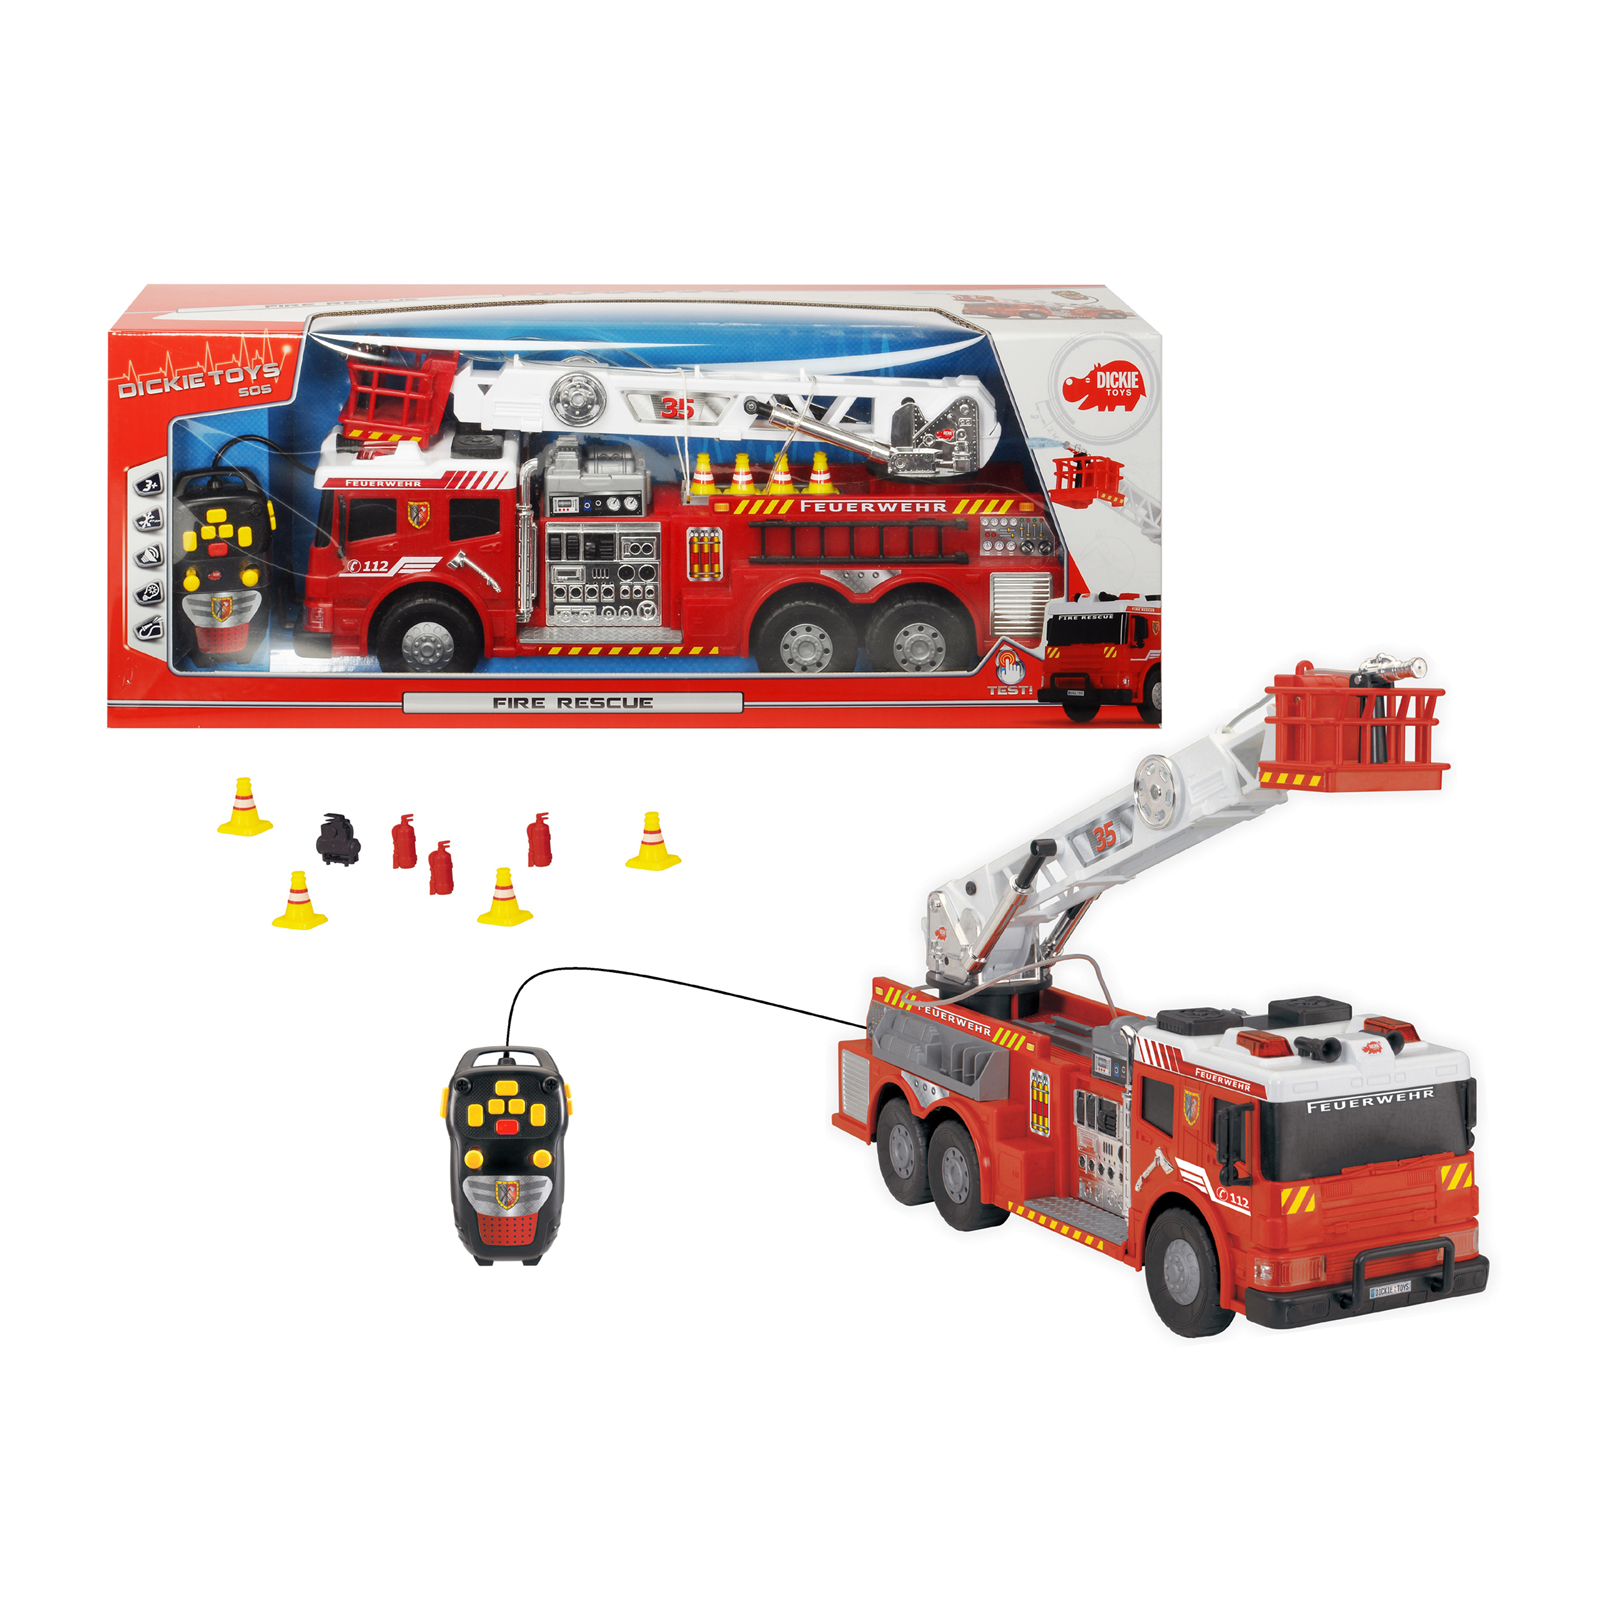 Toy Fire Trucks